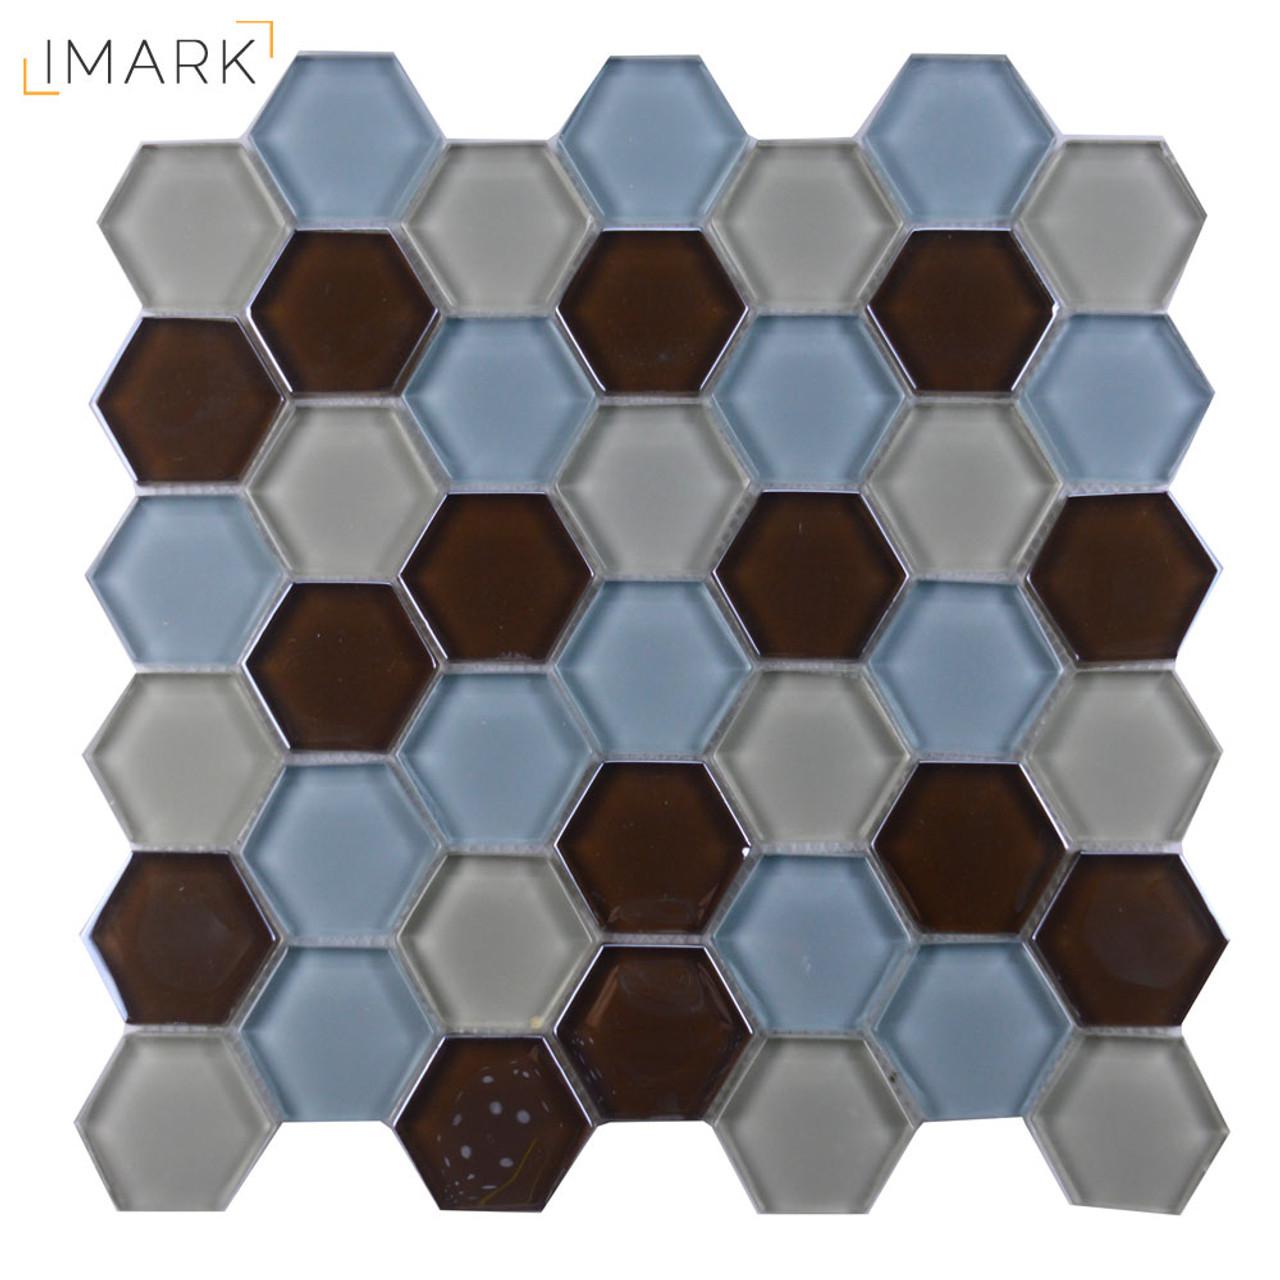 Hexagon Crystal Glass Mosaic Backsplash Tile